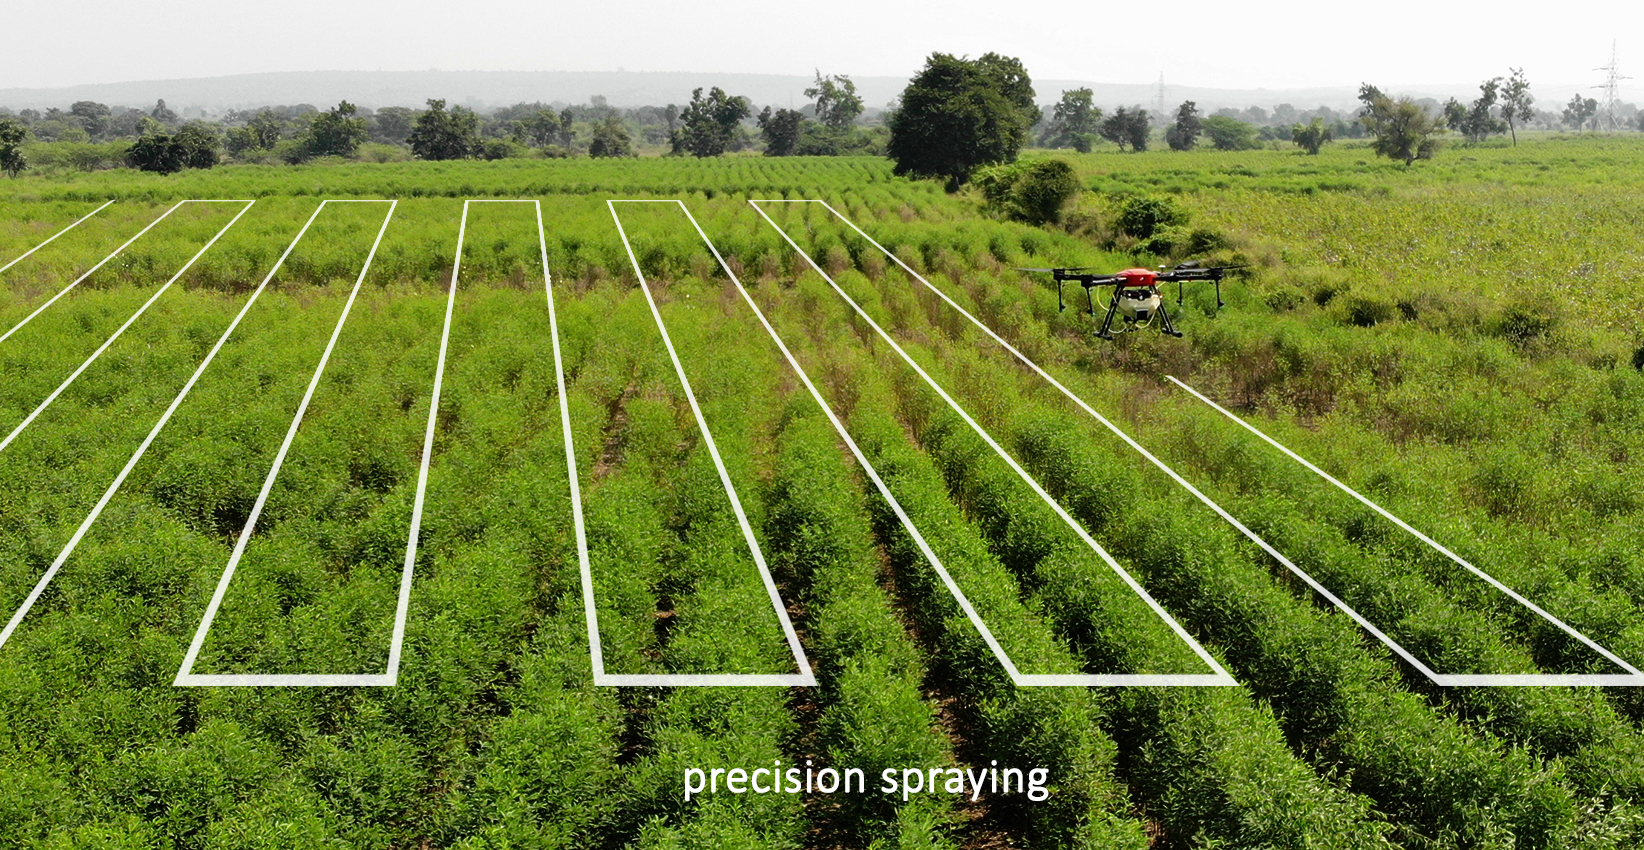 precision spraying